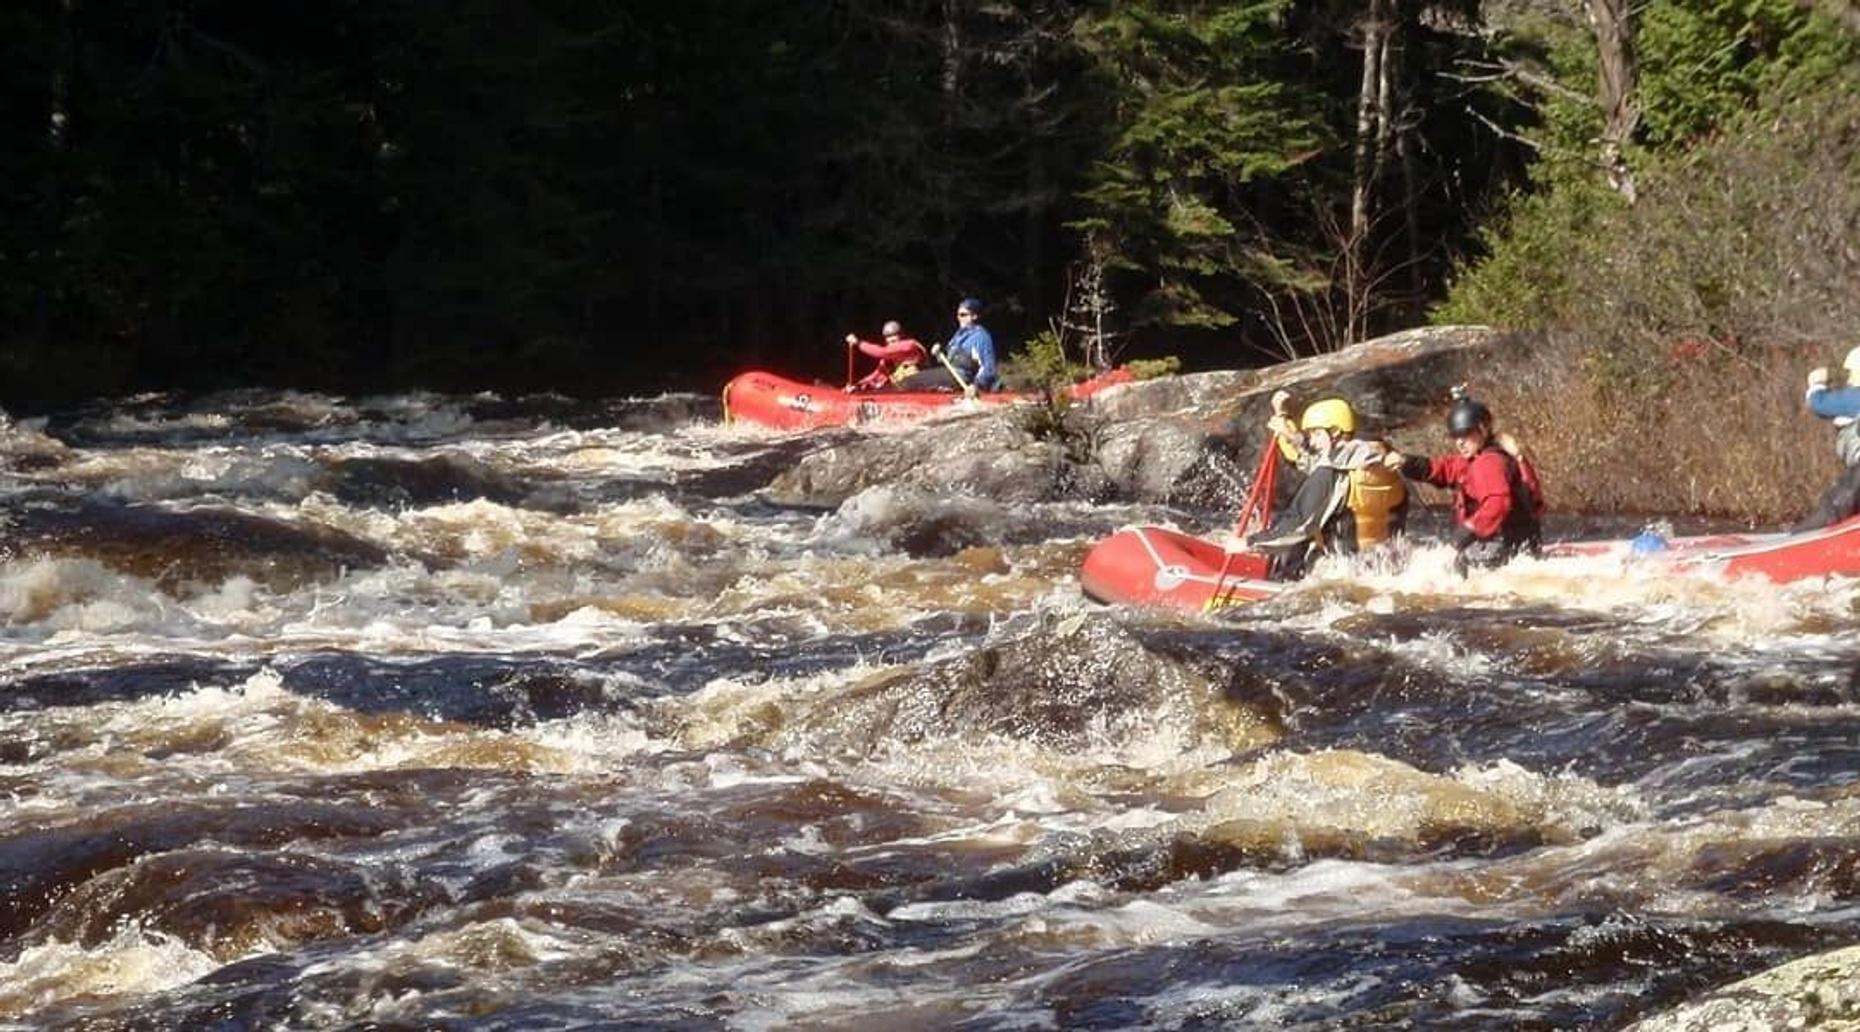 Hudson River Rafting Day Trip Class III-IV